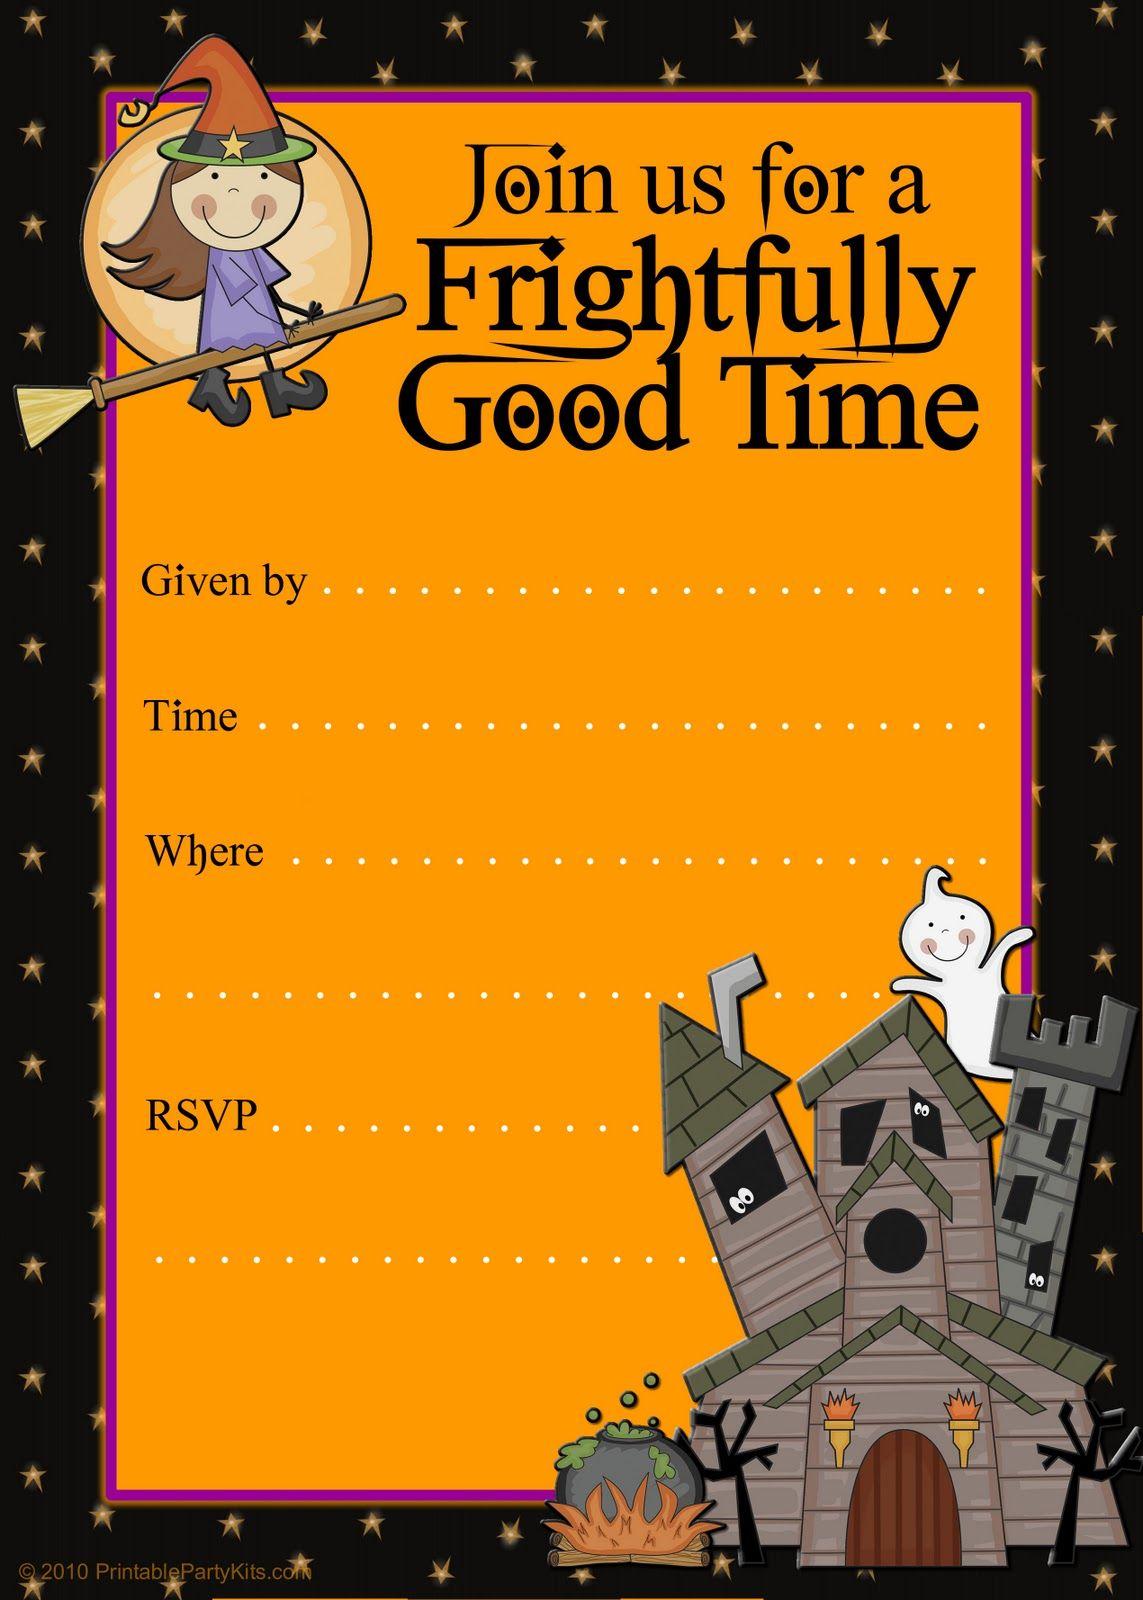 Free Halloween Flyer Invitations Printable   Food   Pinterest - Free Printable Birthday Party Flyers